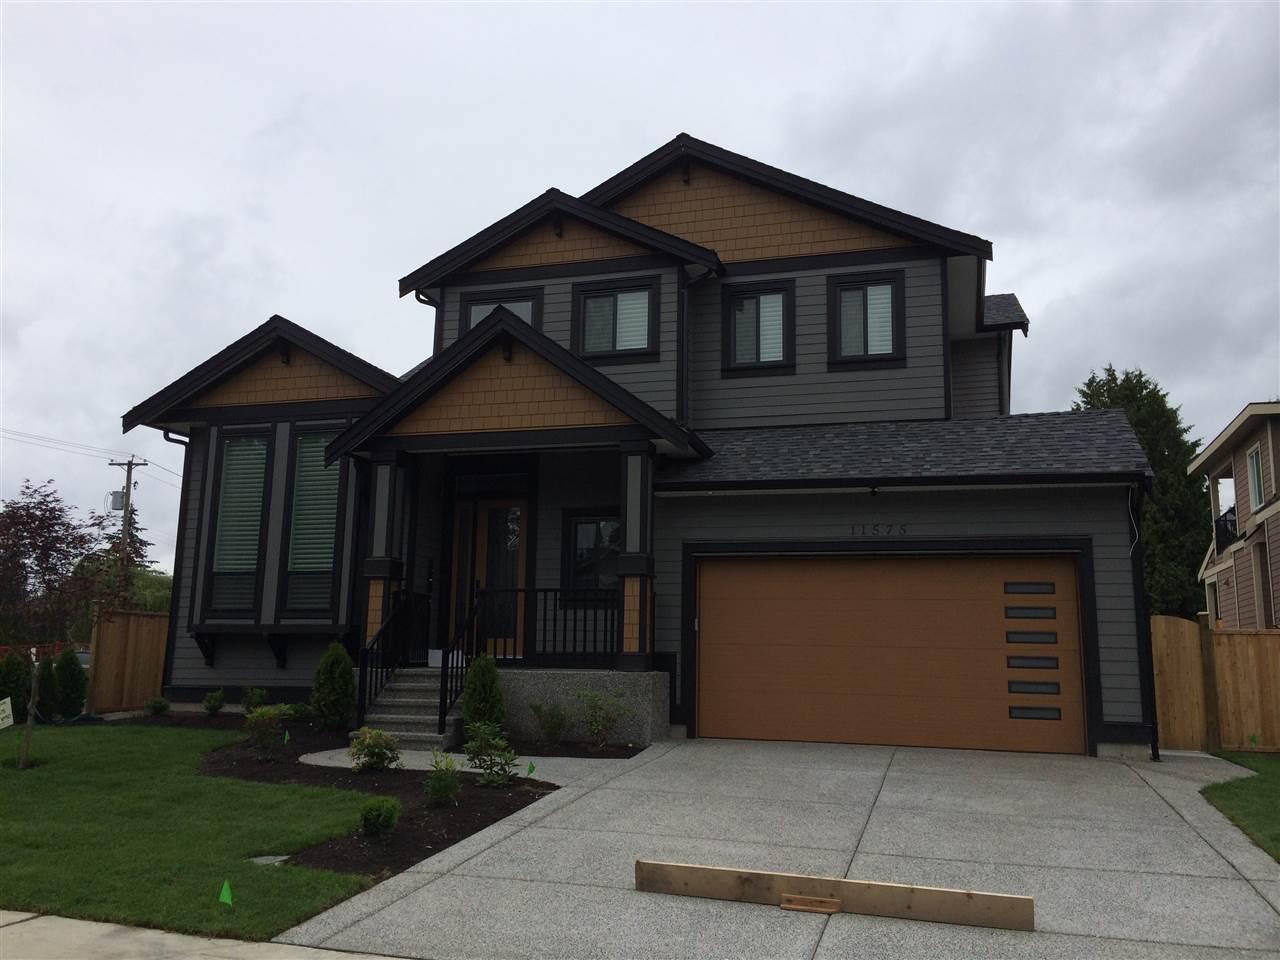 11575 RIVER WYND, Maple Ridge, BC, V2X 7G9 Photo 1